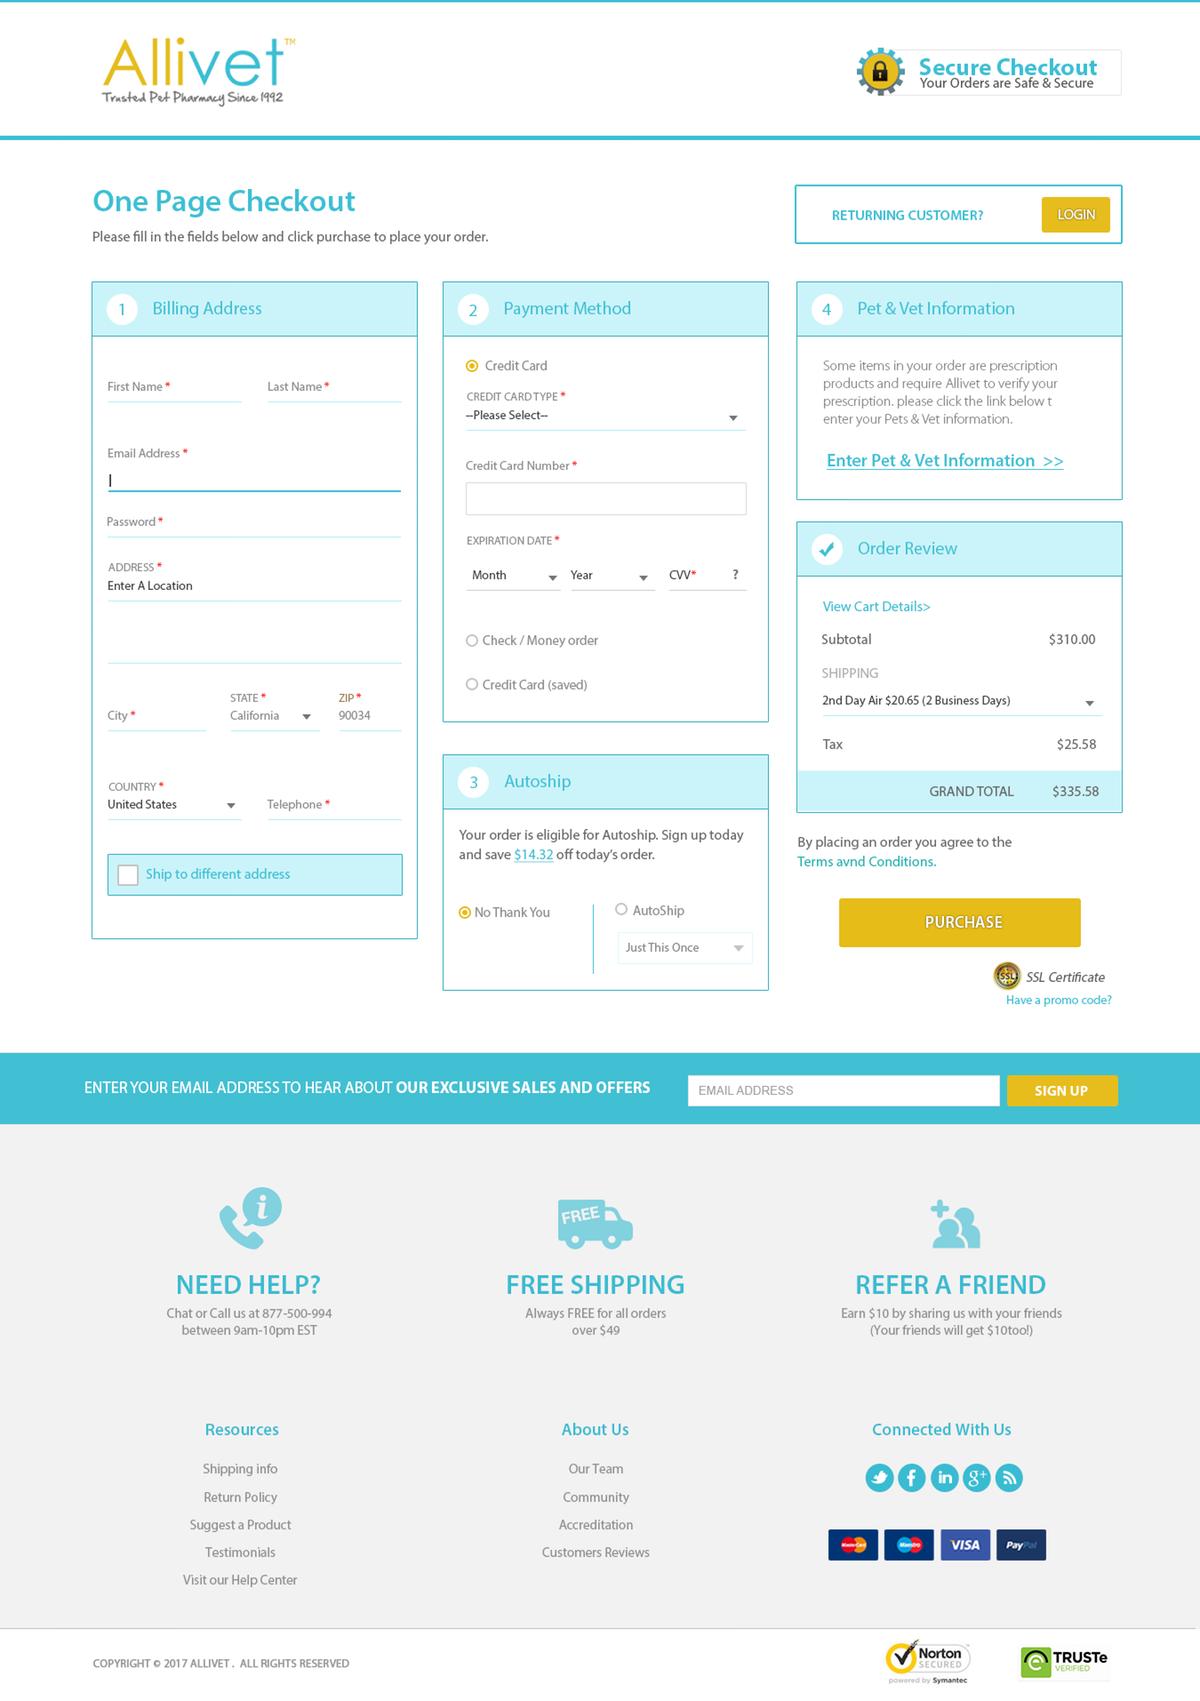 Allivet One Page Checkout Design